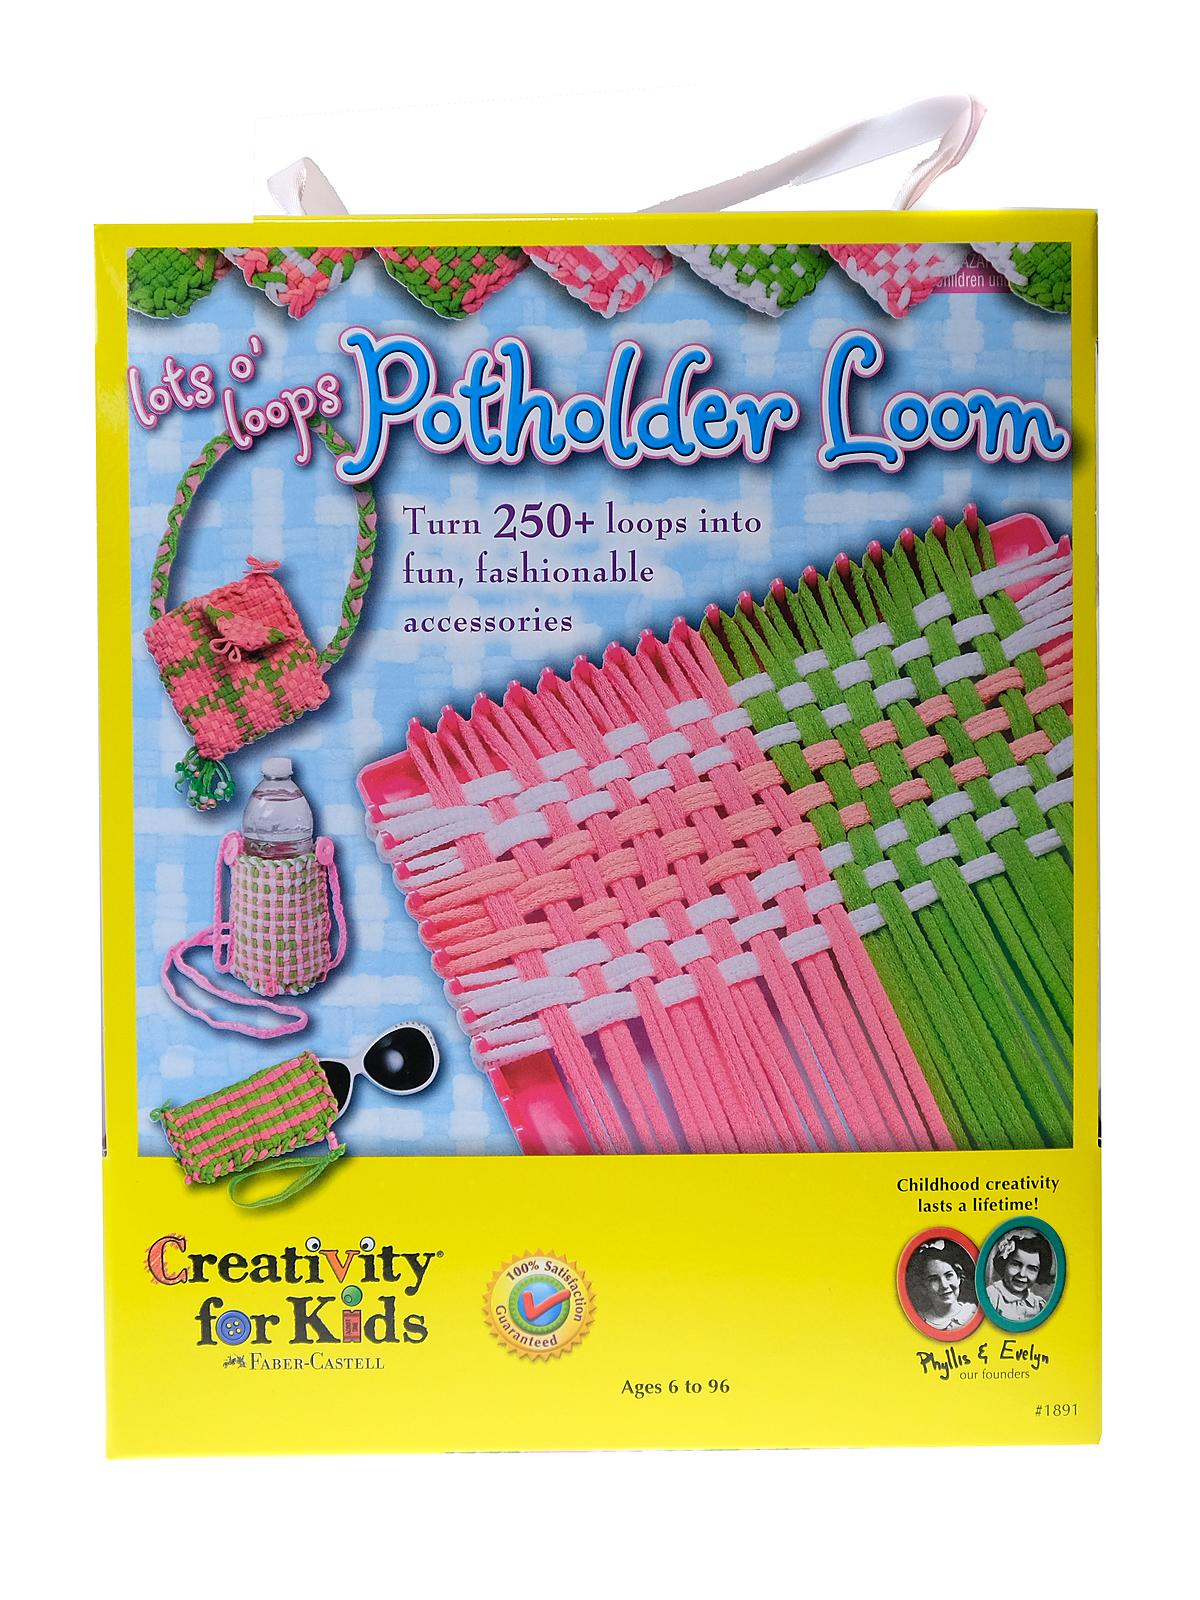 Lots o' Loops Potholder Loom